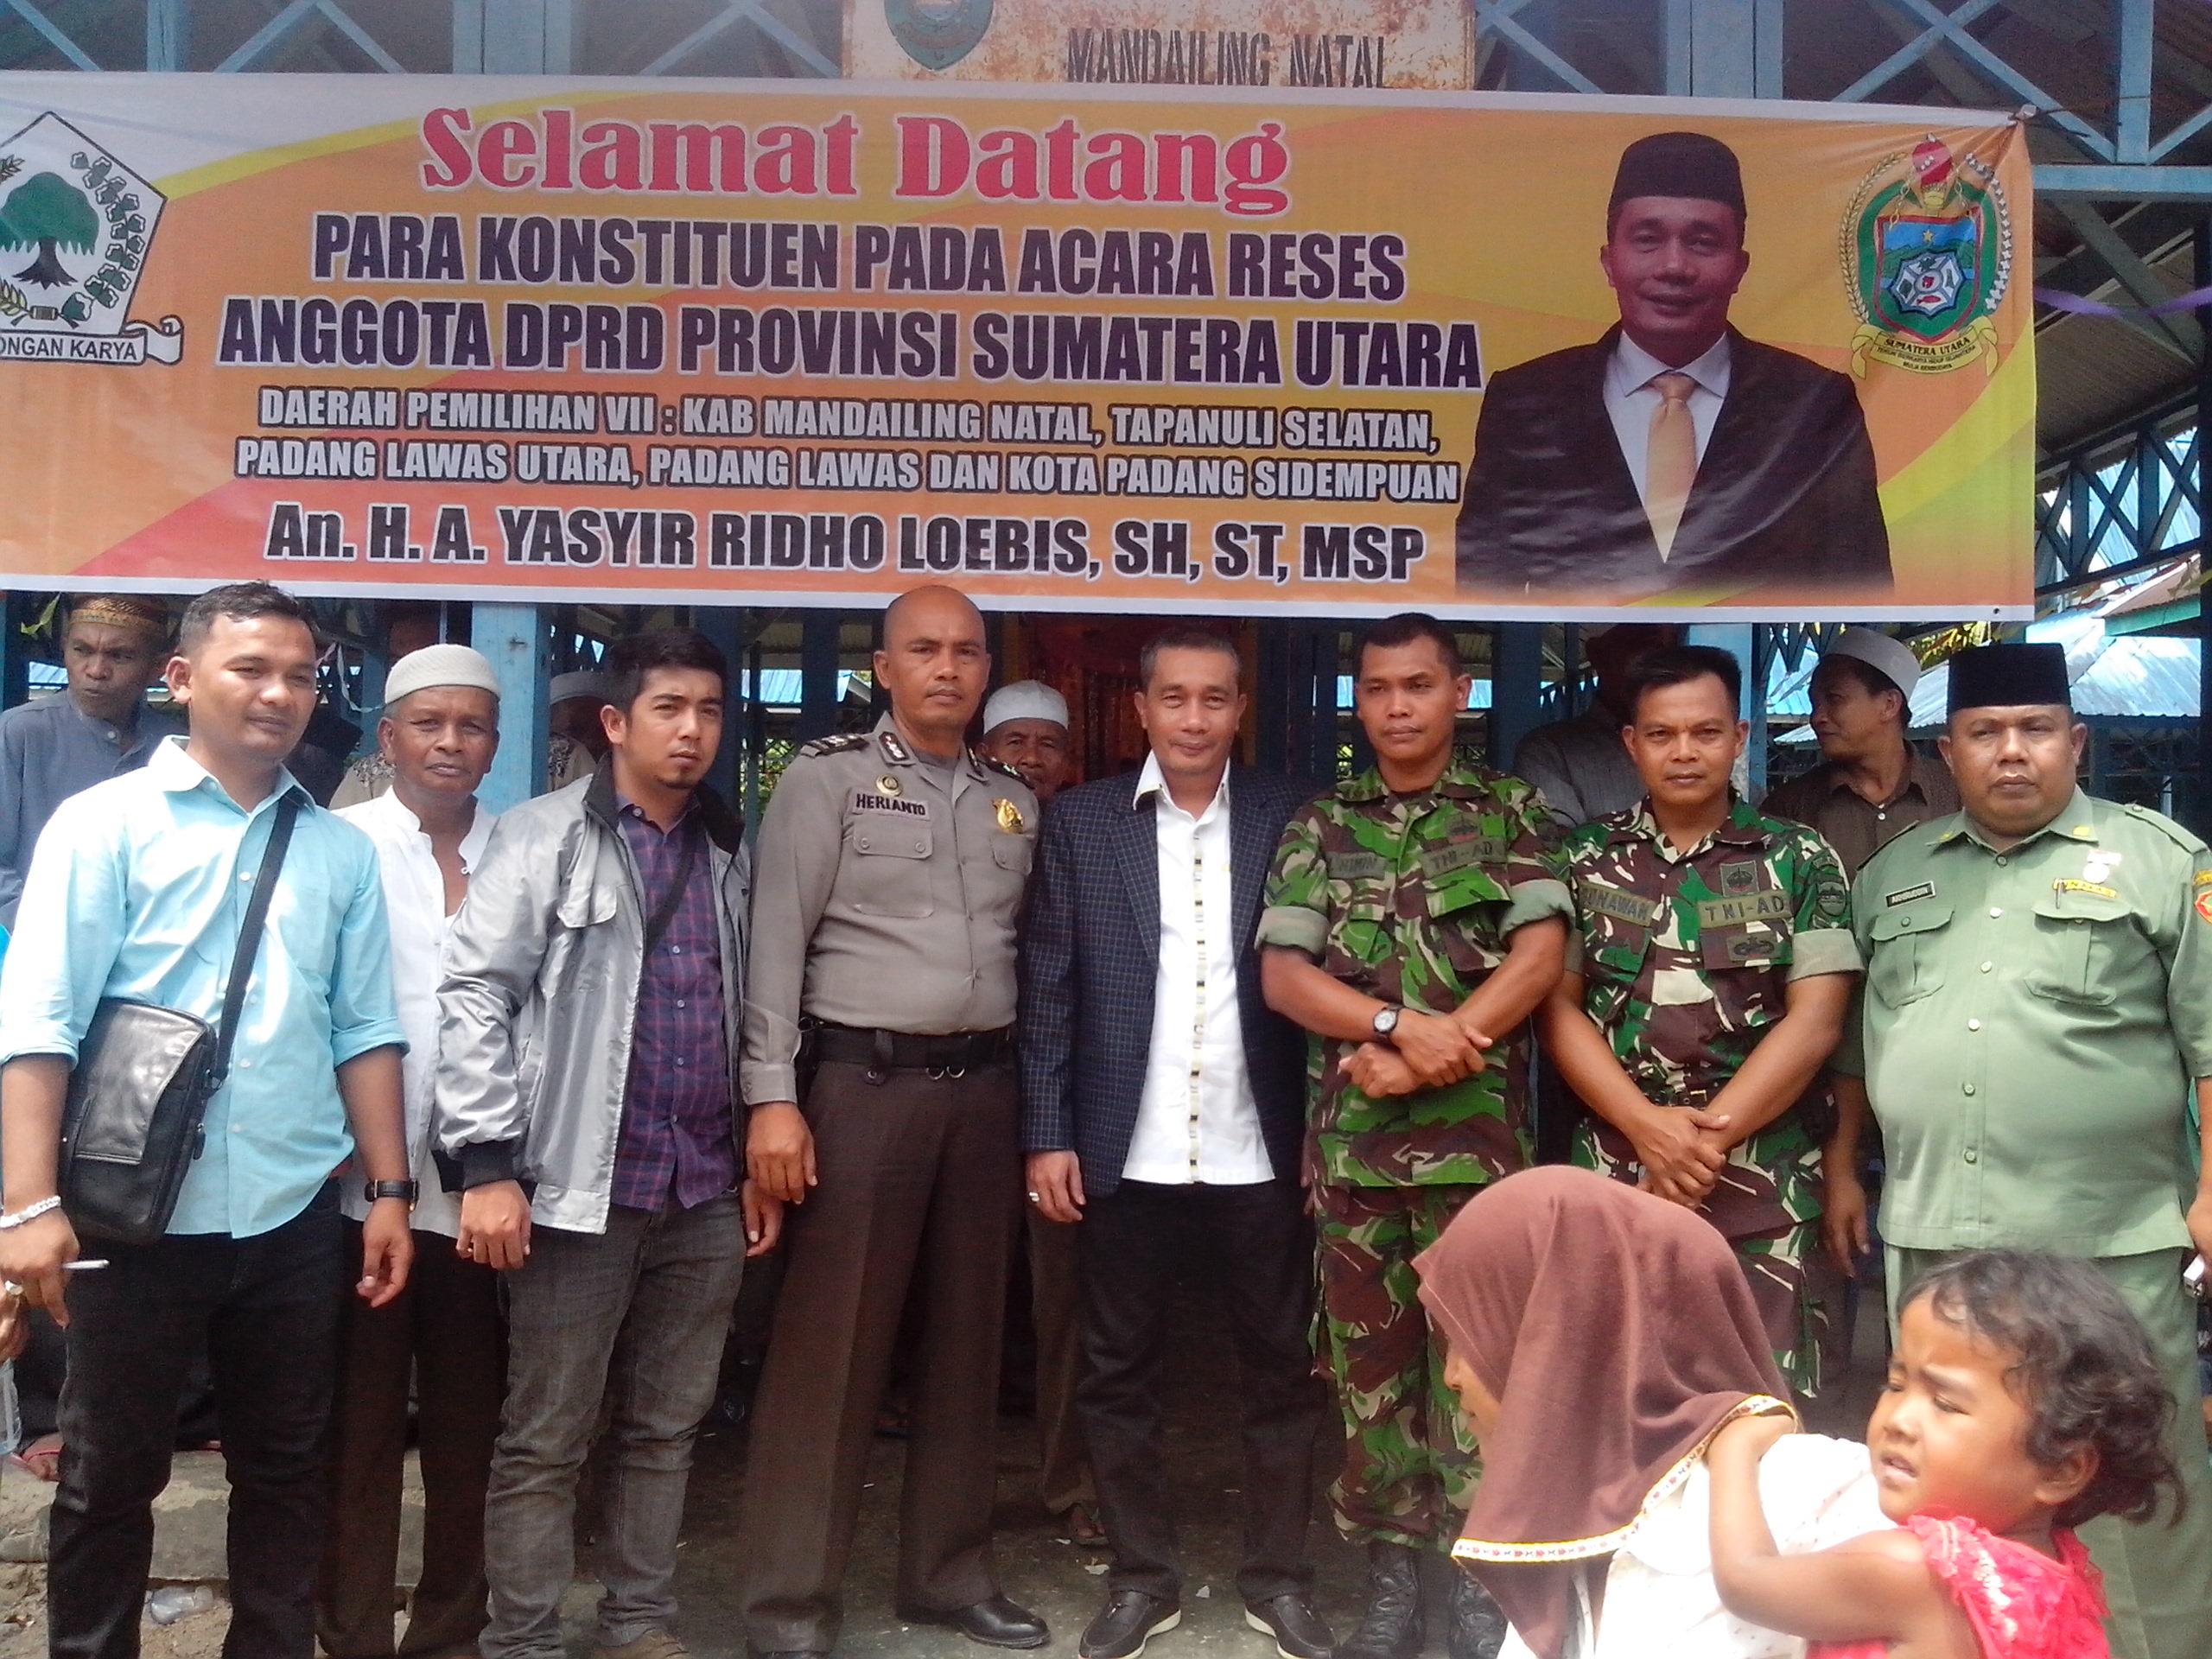 Reses Anggota DPRD Provinsi H.A.Yasir Ridho Lubis, SH, ST, MSP (1)